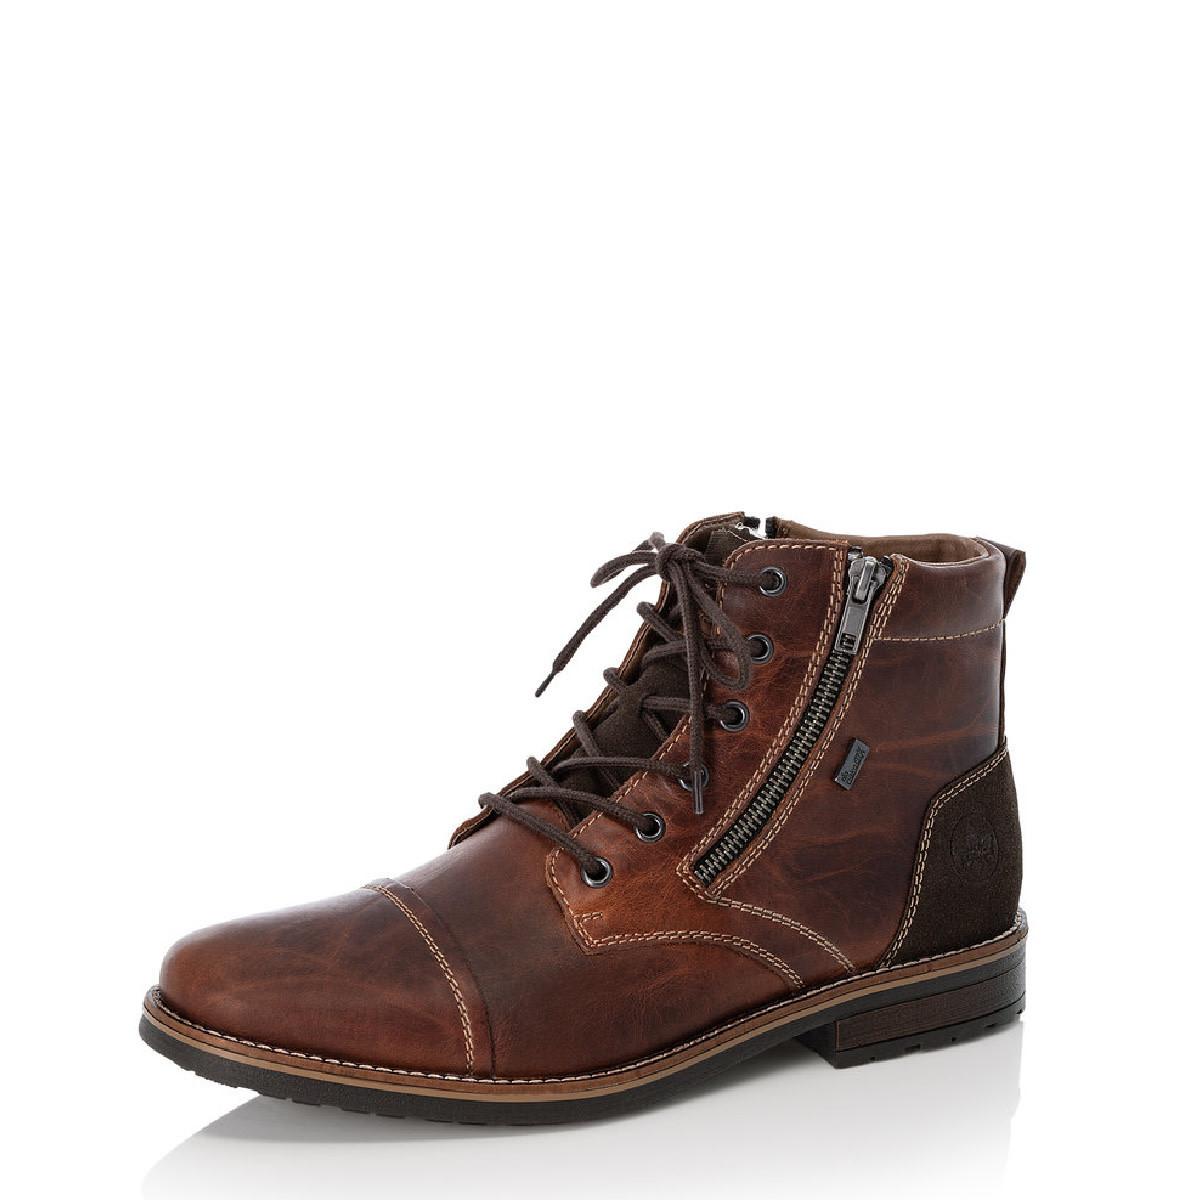 Rieker Elias 33200-24 Brown